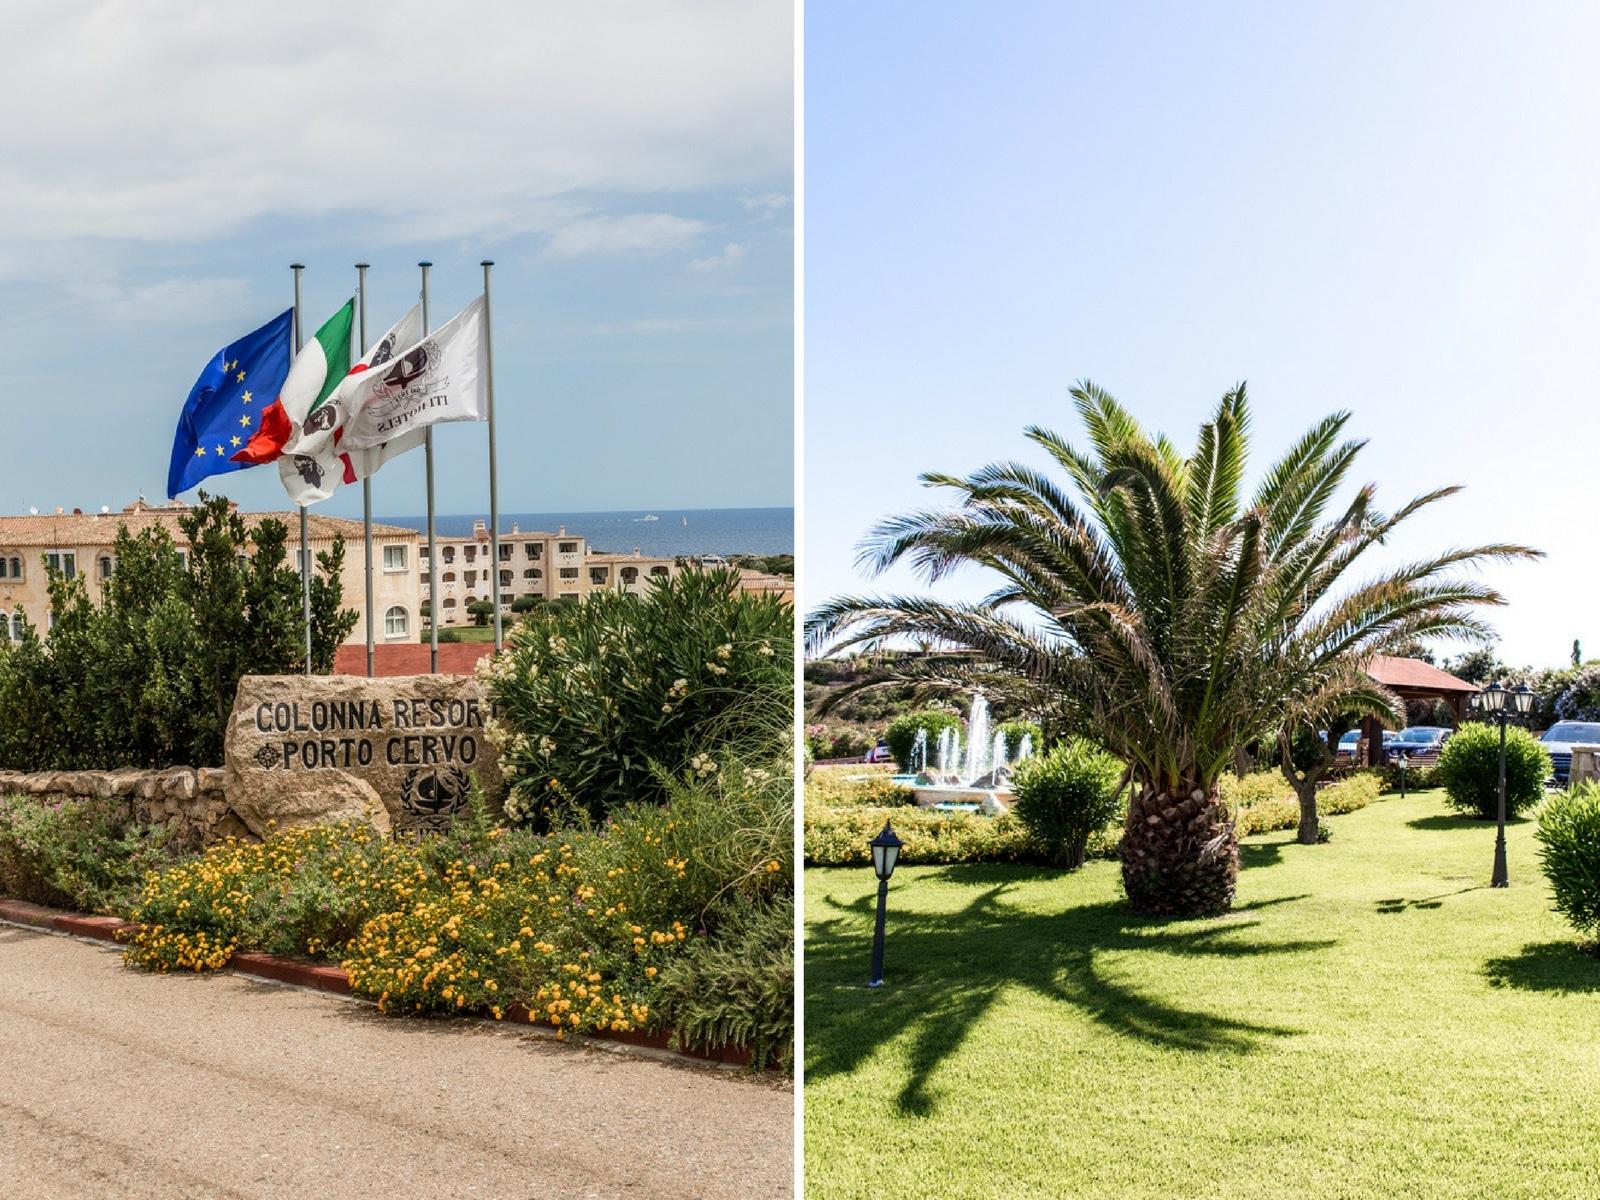 colonna resort costa smeralda, sardinien, italien